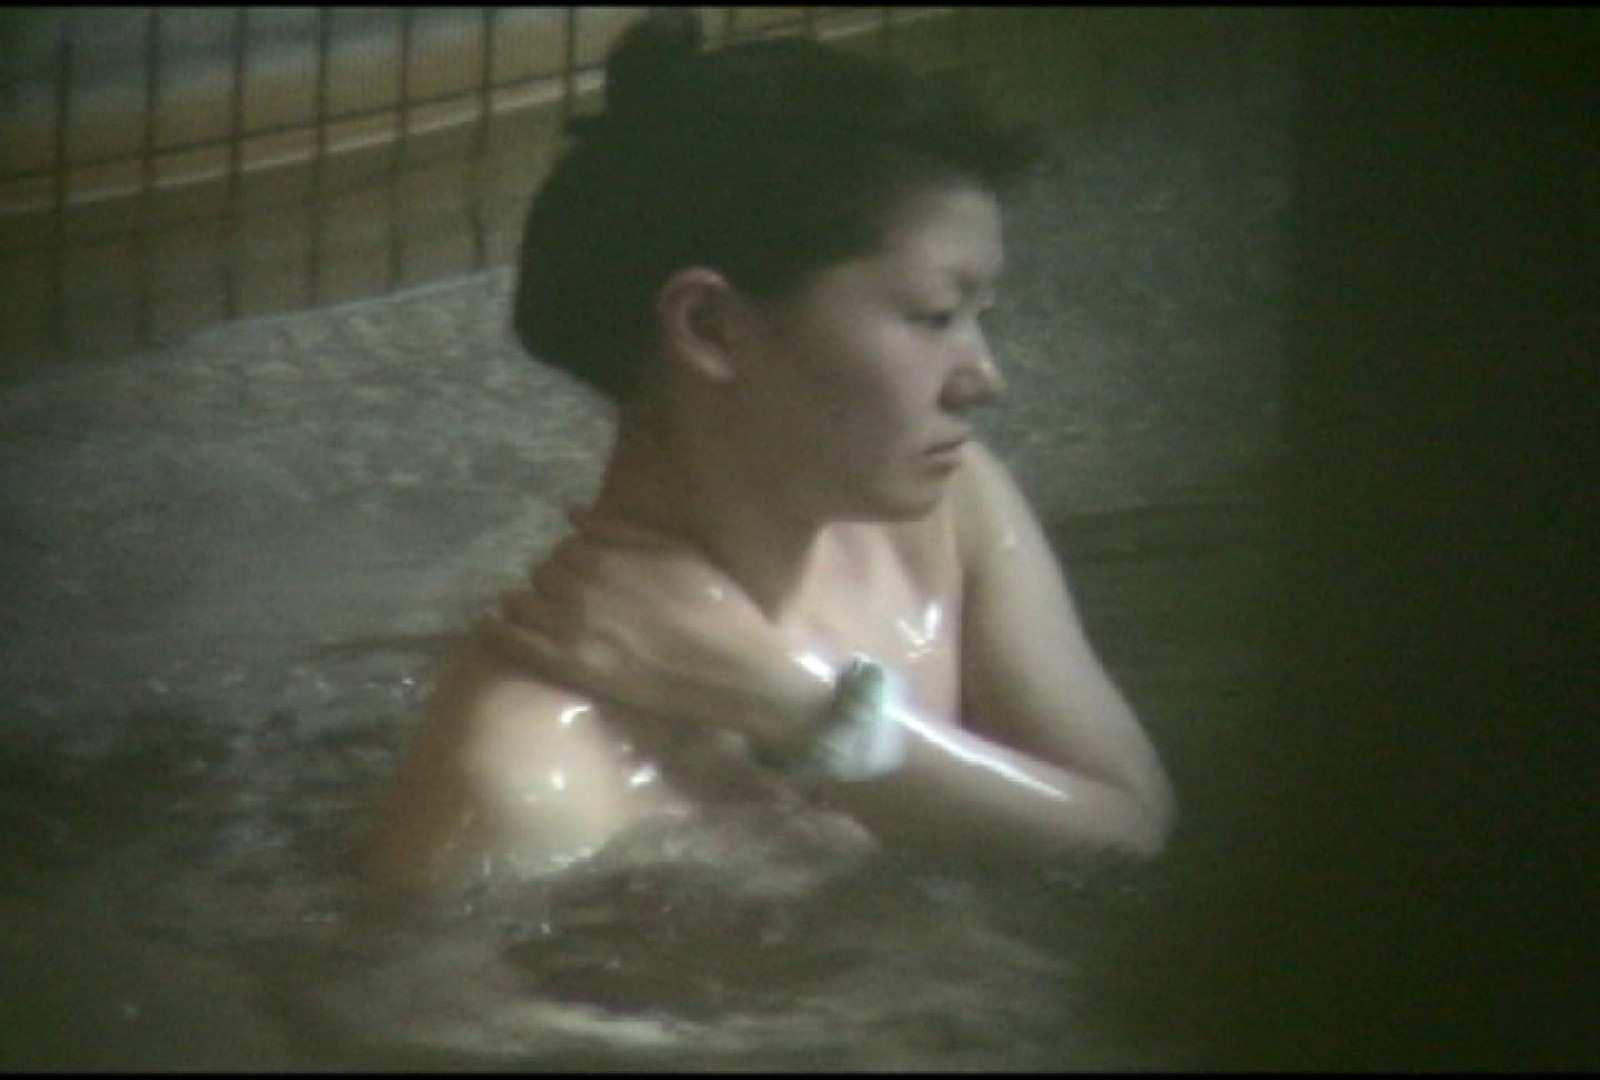 Aquaな露天風呂Vol.699 いやらしいOL セックス画像 91連発 32